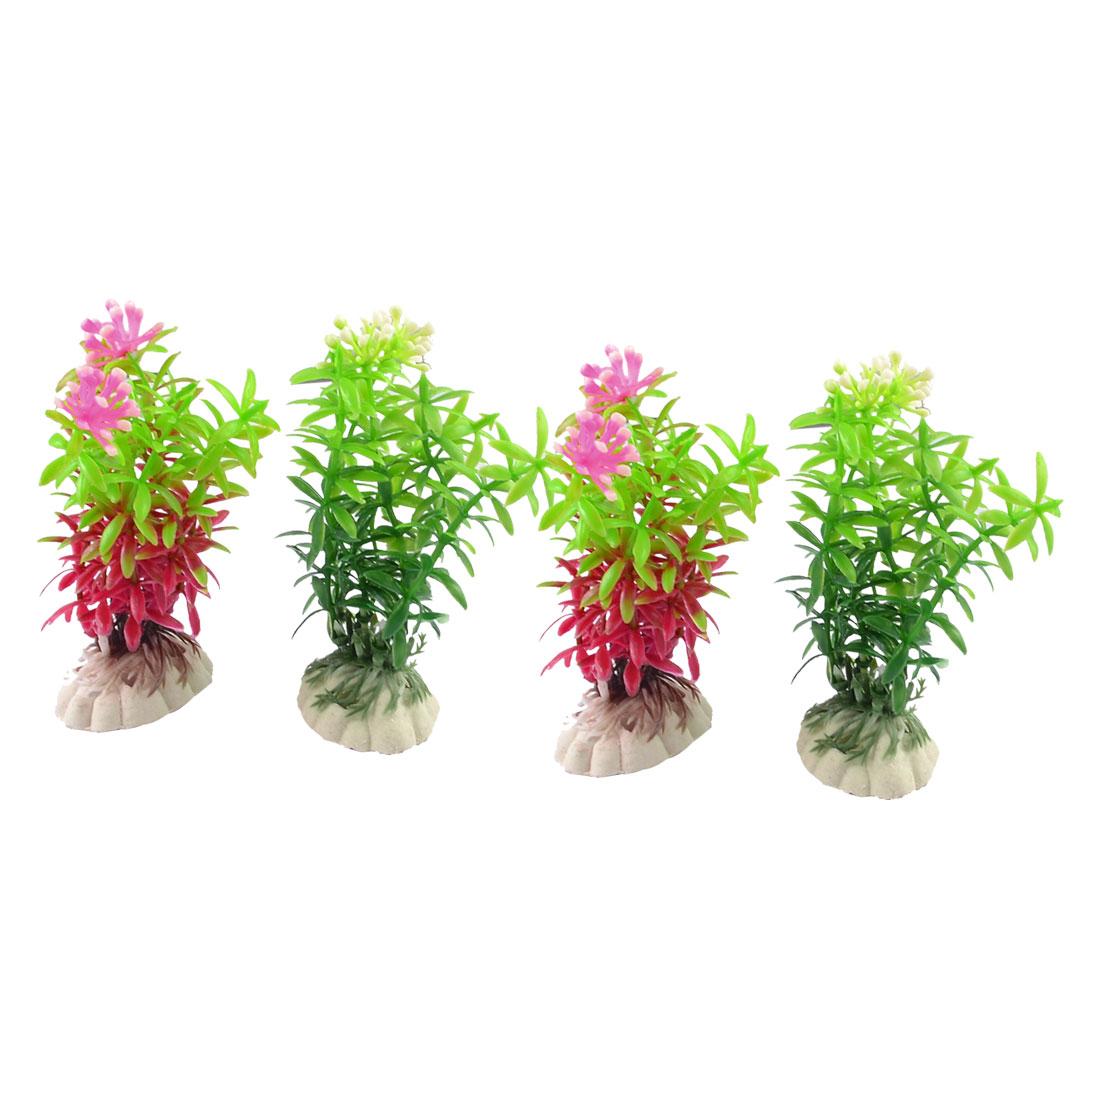 Aquariums Fish Tank Decoration Green Burgundy Aquatic Plastic Plants Grass 4 in 1